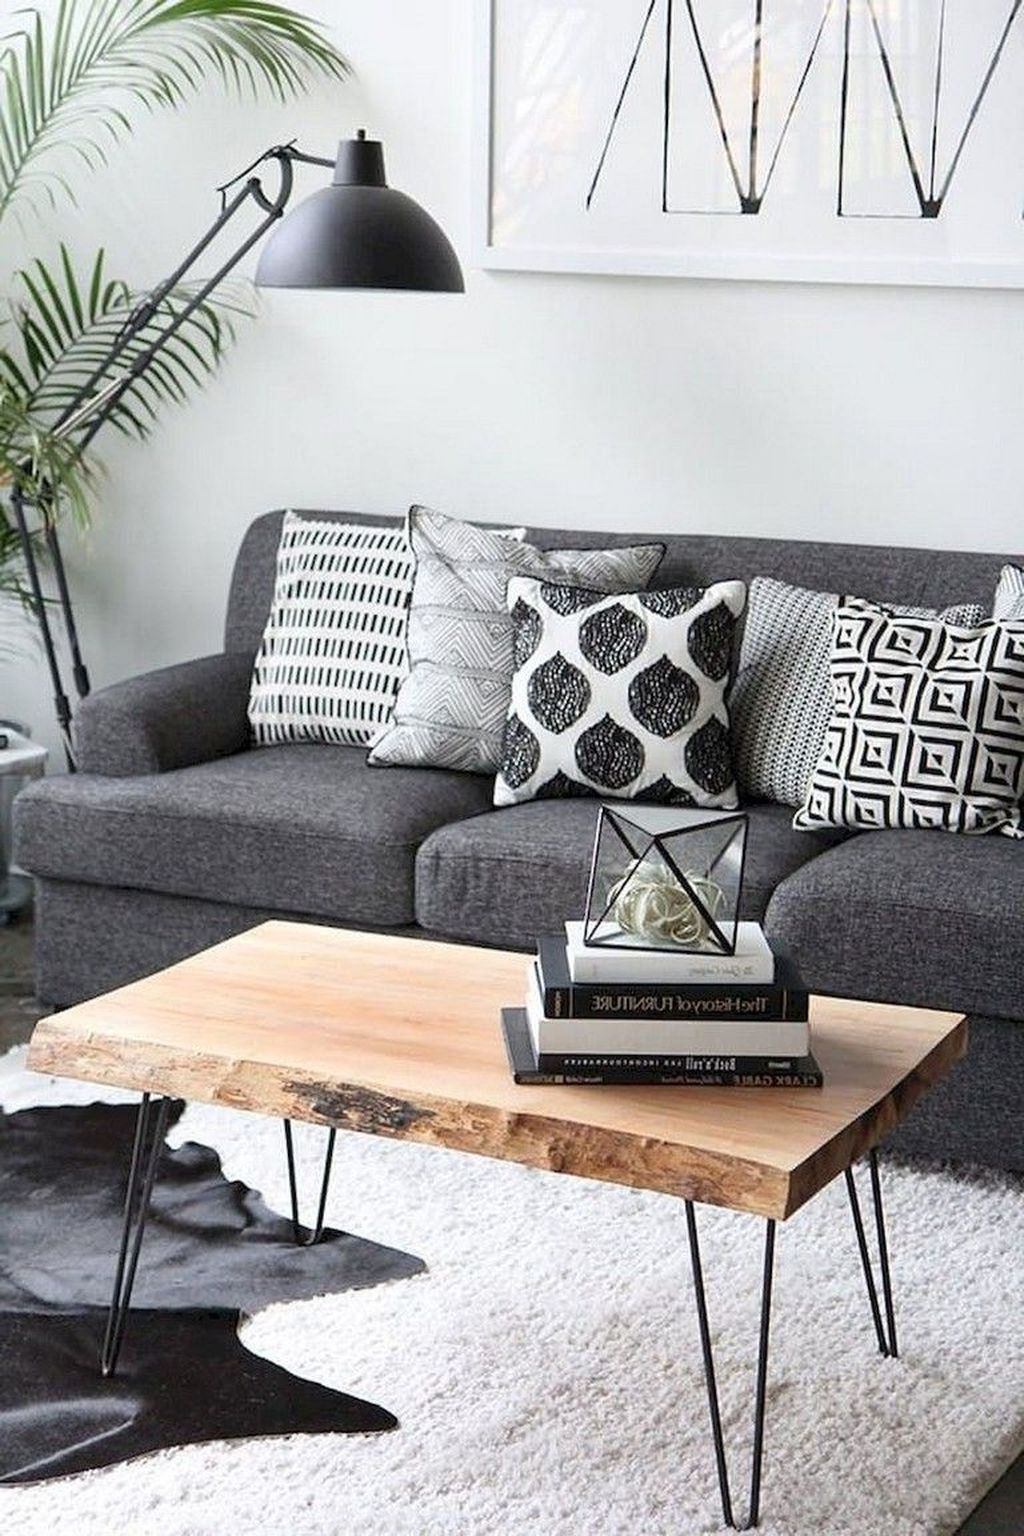 Best Minimalist Living Room Decorations Ideas 14